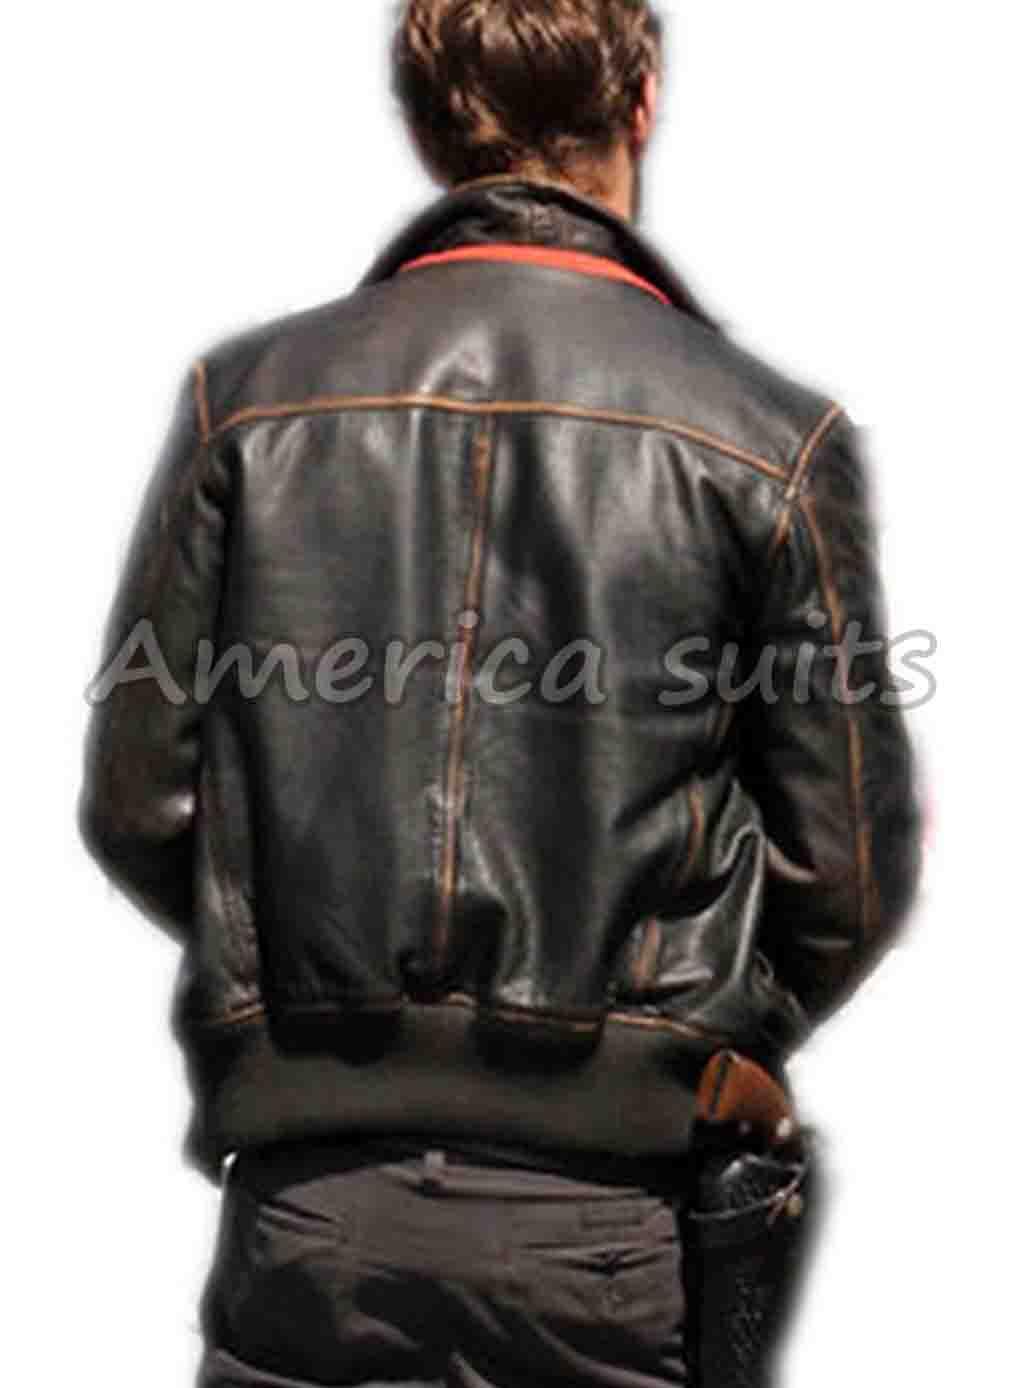 jamie-dornan-once-upo-a time-sheriff -graham-black-leather-jacket-200x200-500x500 (3)